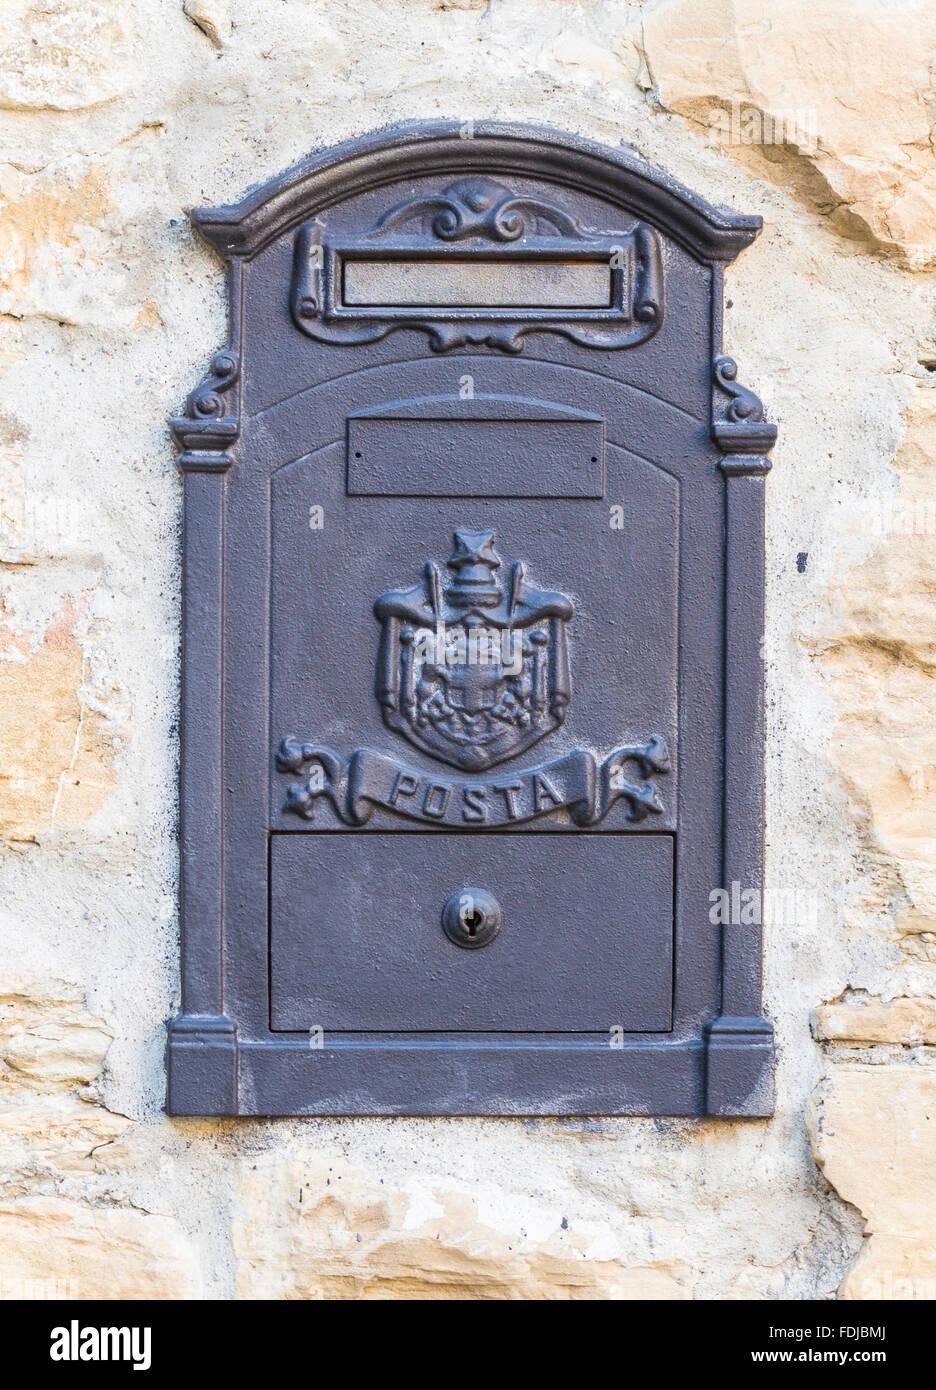 decorative postbox photos & decorative postbox images - alamy